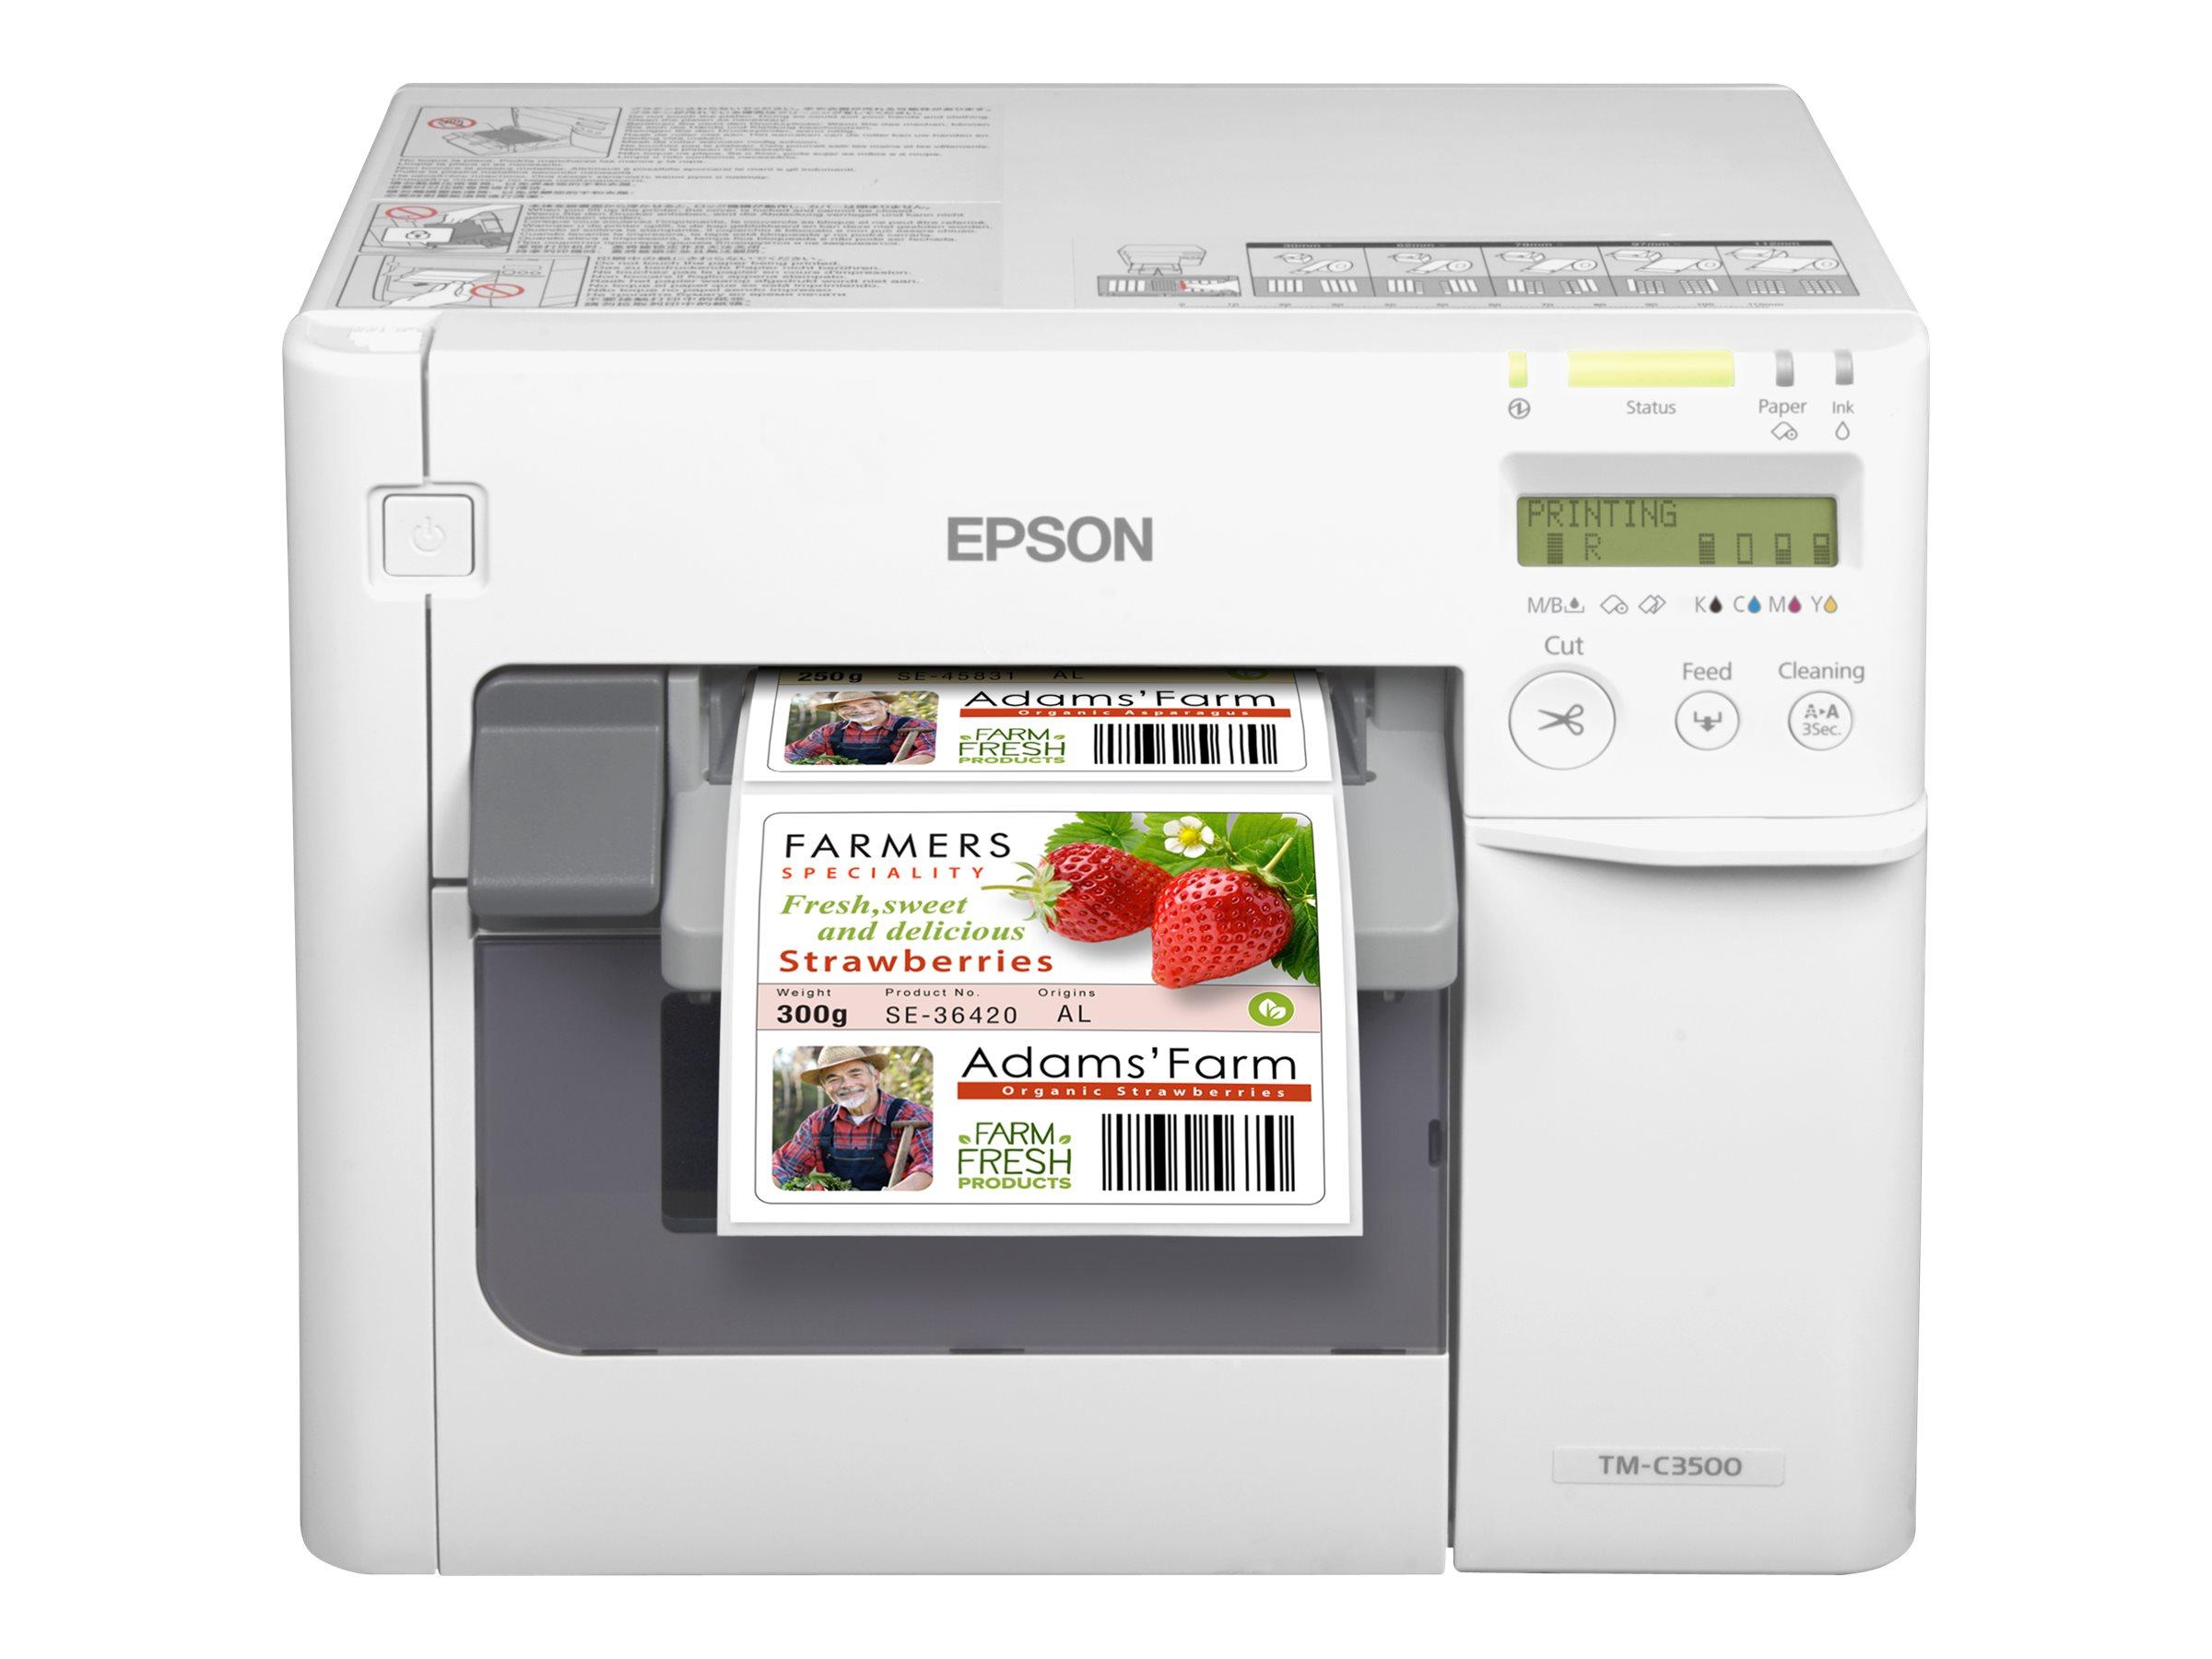 Epson TM C3500 - Etikettendrucker - Farbe - Tintenstrahl - 112 mm (Breite) - 720 x 360 dpi